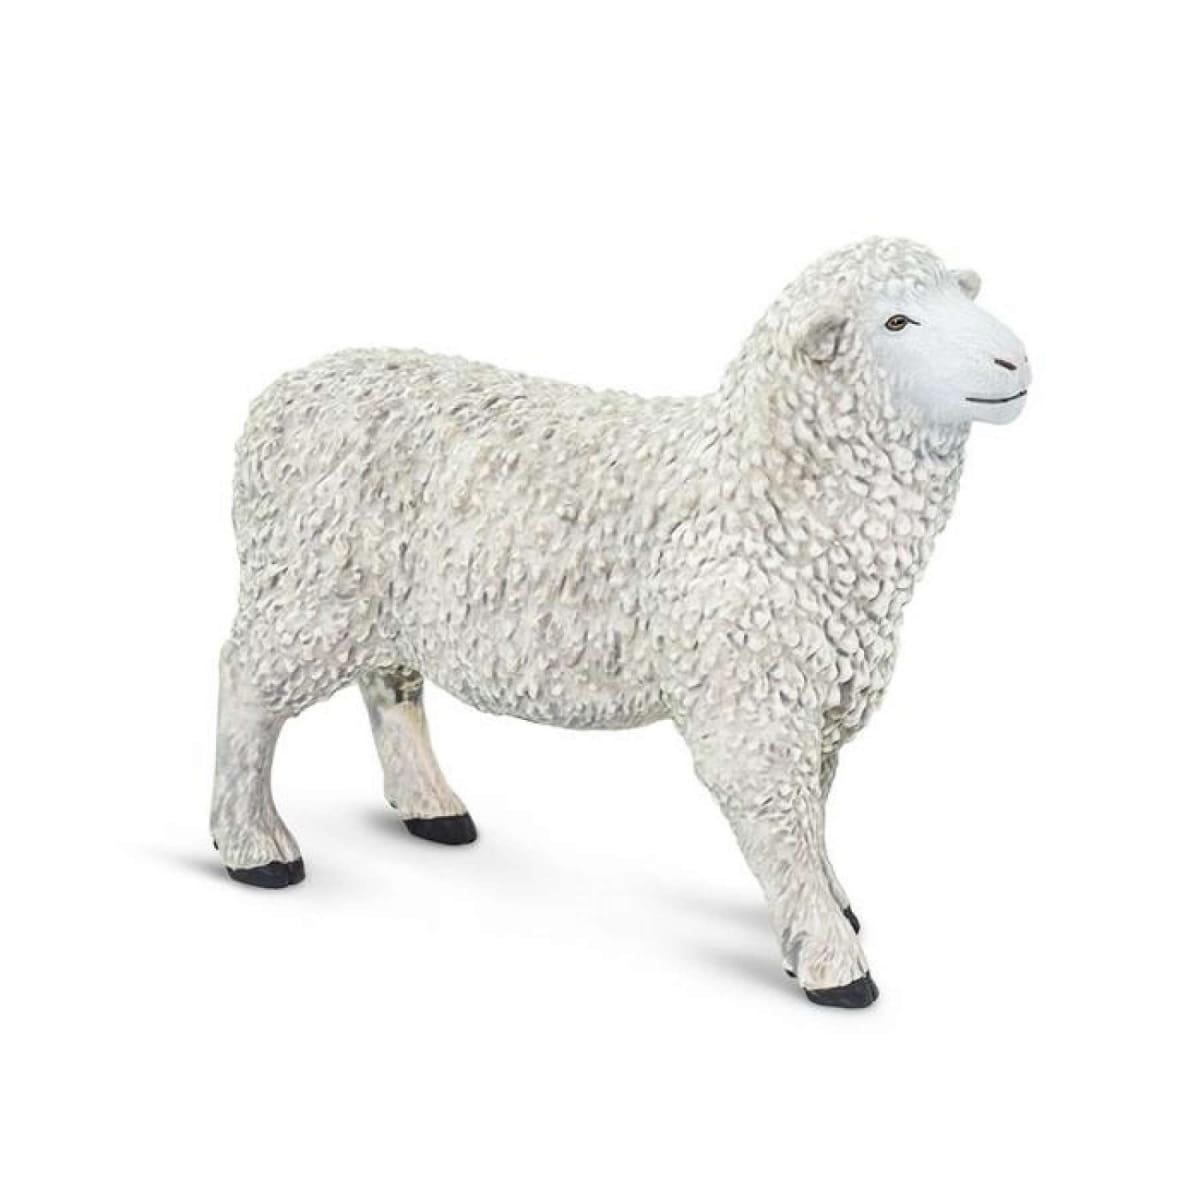 Фигурка SAFARI Овца 2 - Фигурки животных